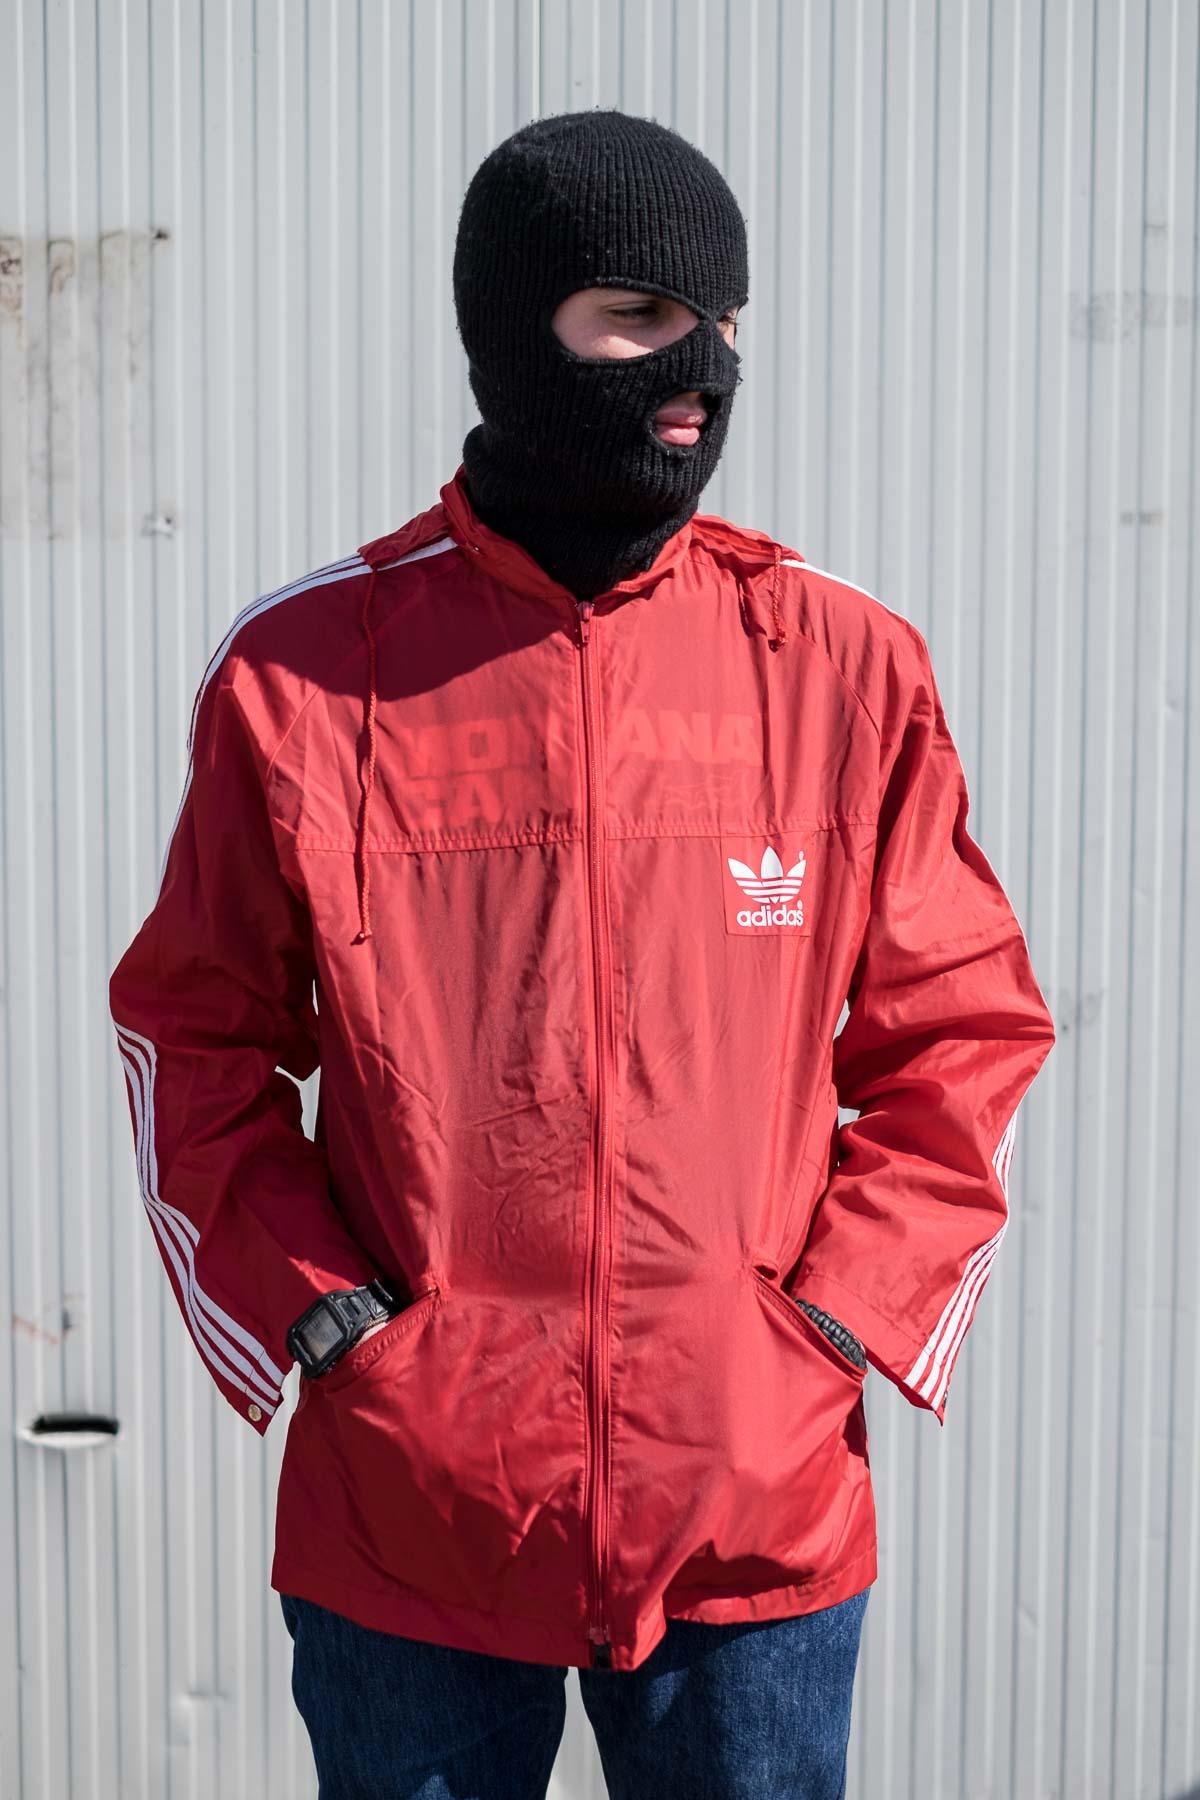 90s Adidas Vento A Giacca Vintage Hard2buff Rosso wxxfBIqpEr 33878d103a13